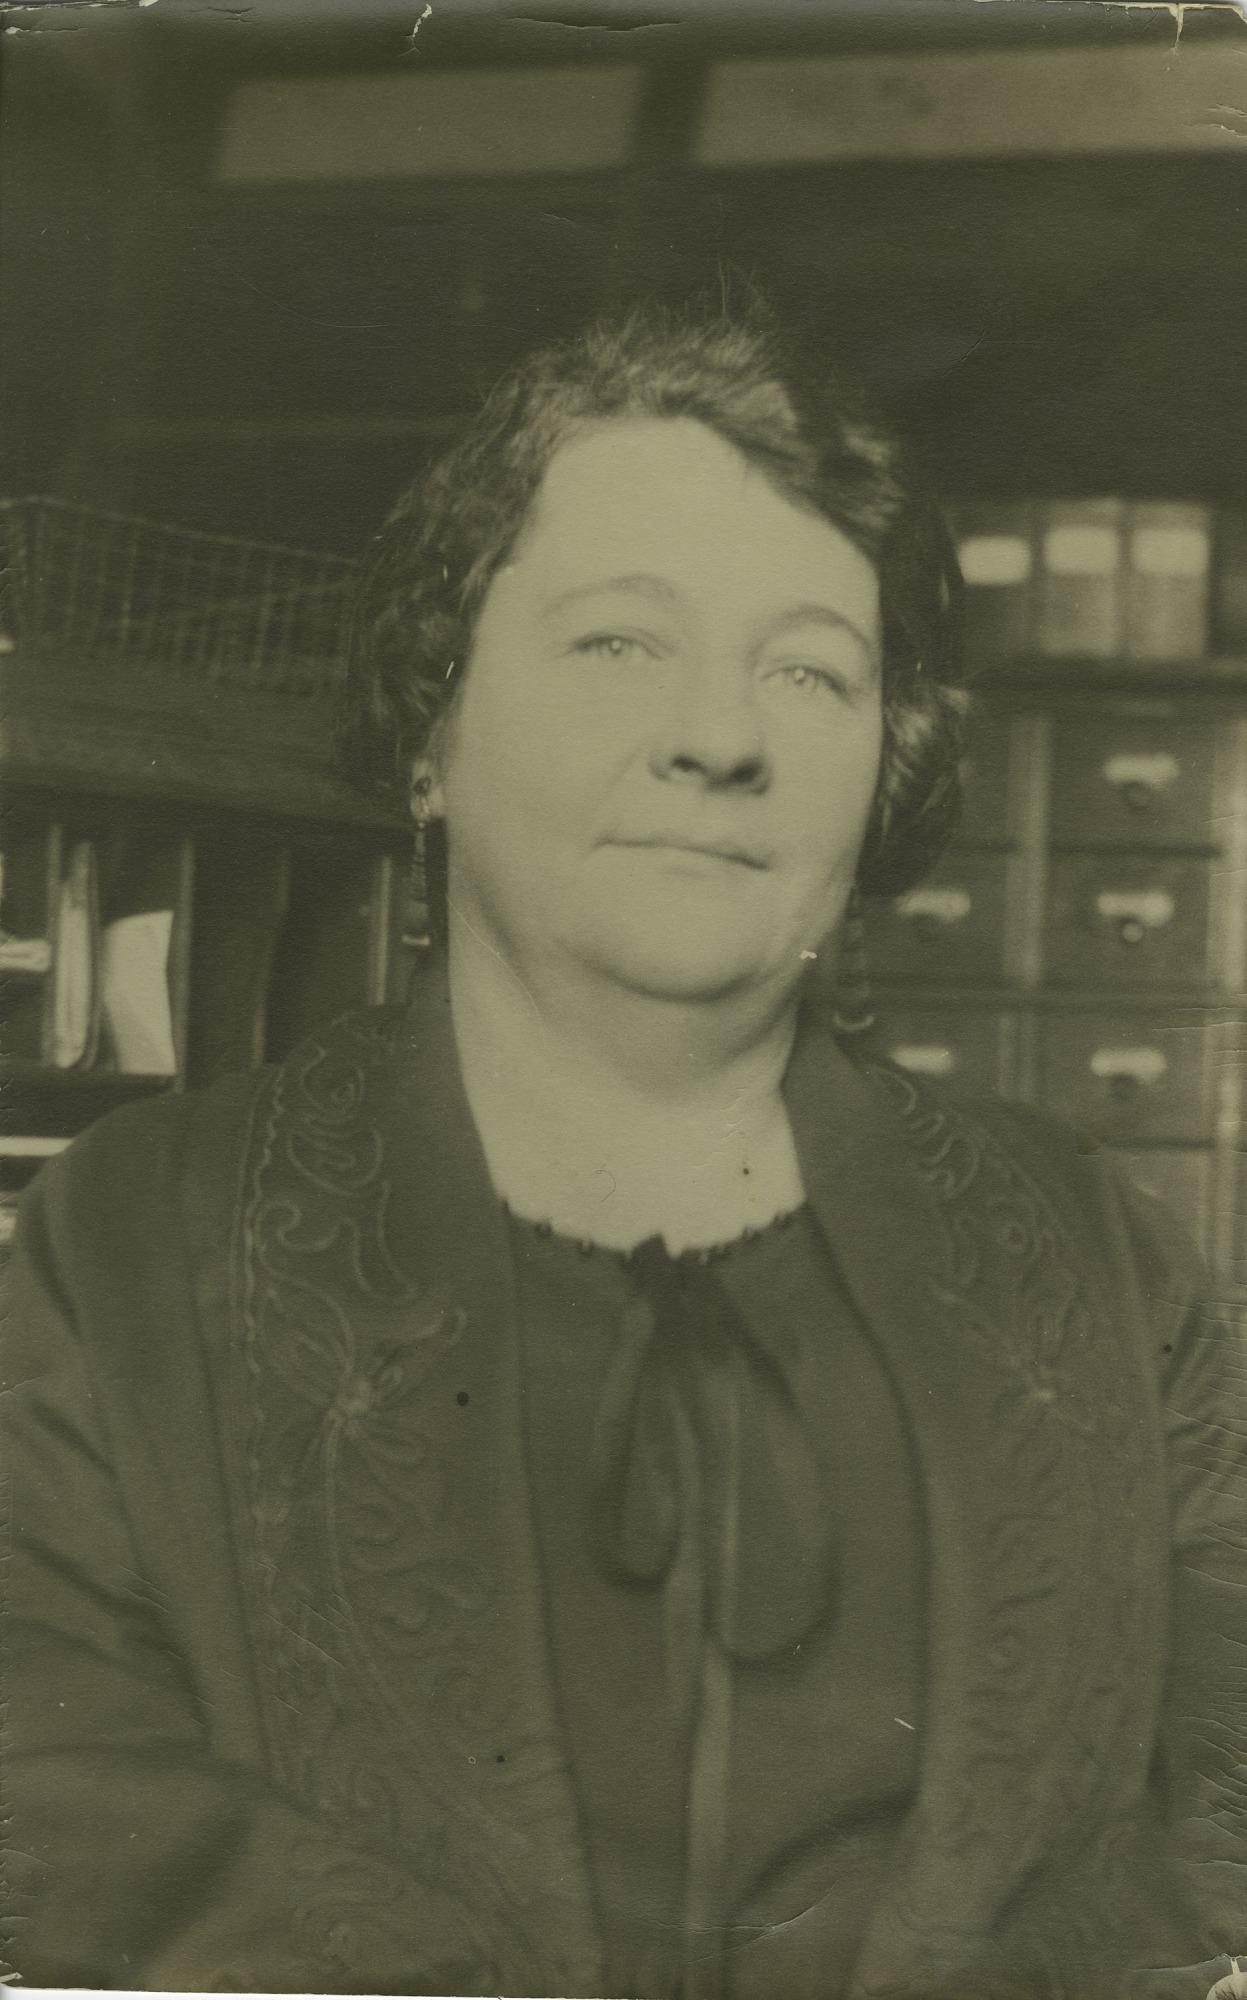 Helene F. Ziska (b. 1893), Smithsonian Institution Archives, SIA Acc. 90-105 [SIA2010-1644].